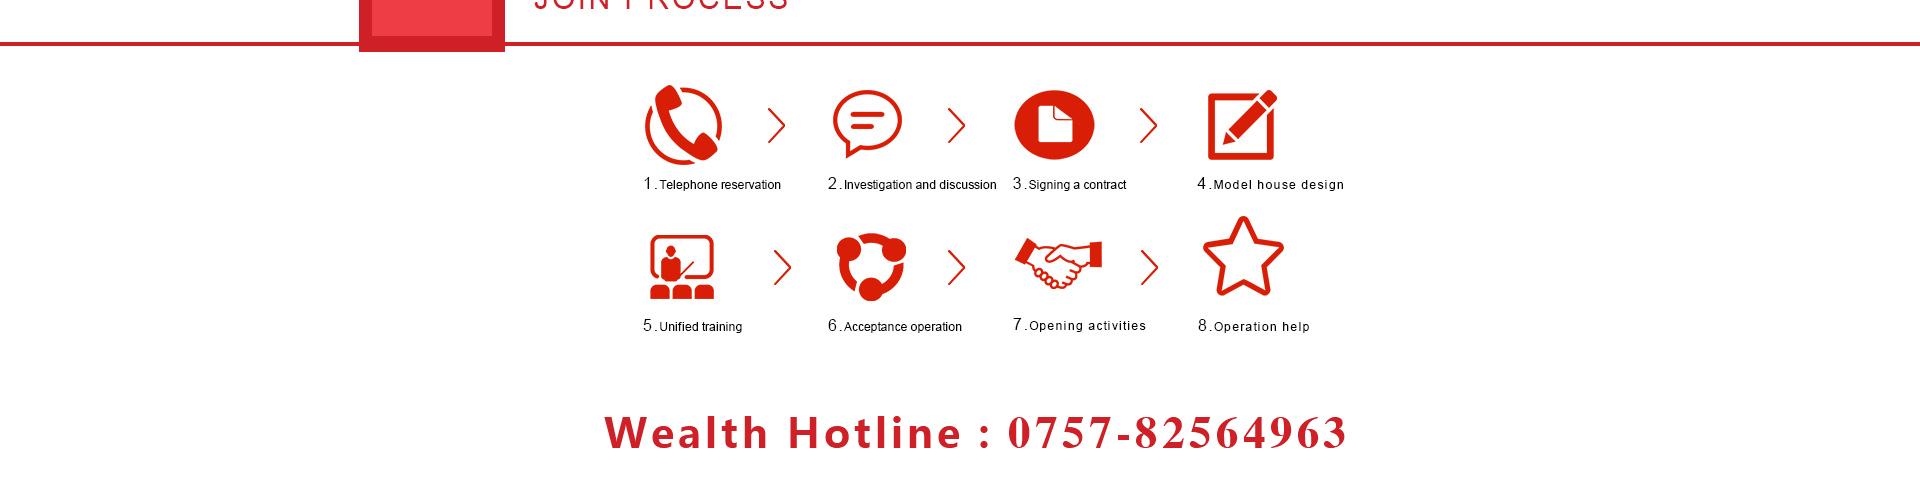 Wealth Hotline:0757-82564963.jpg